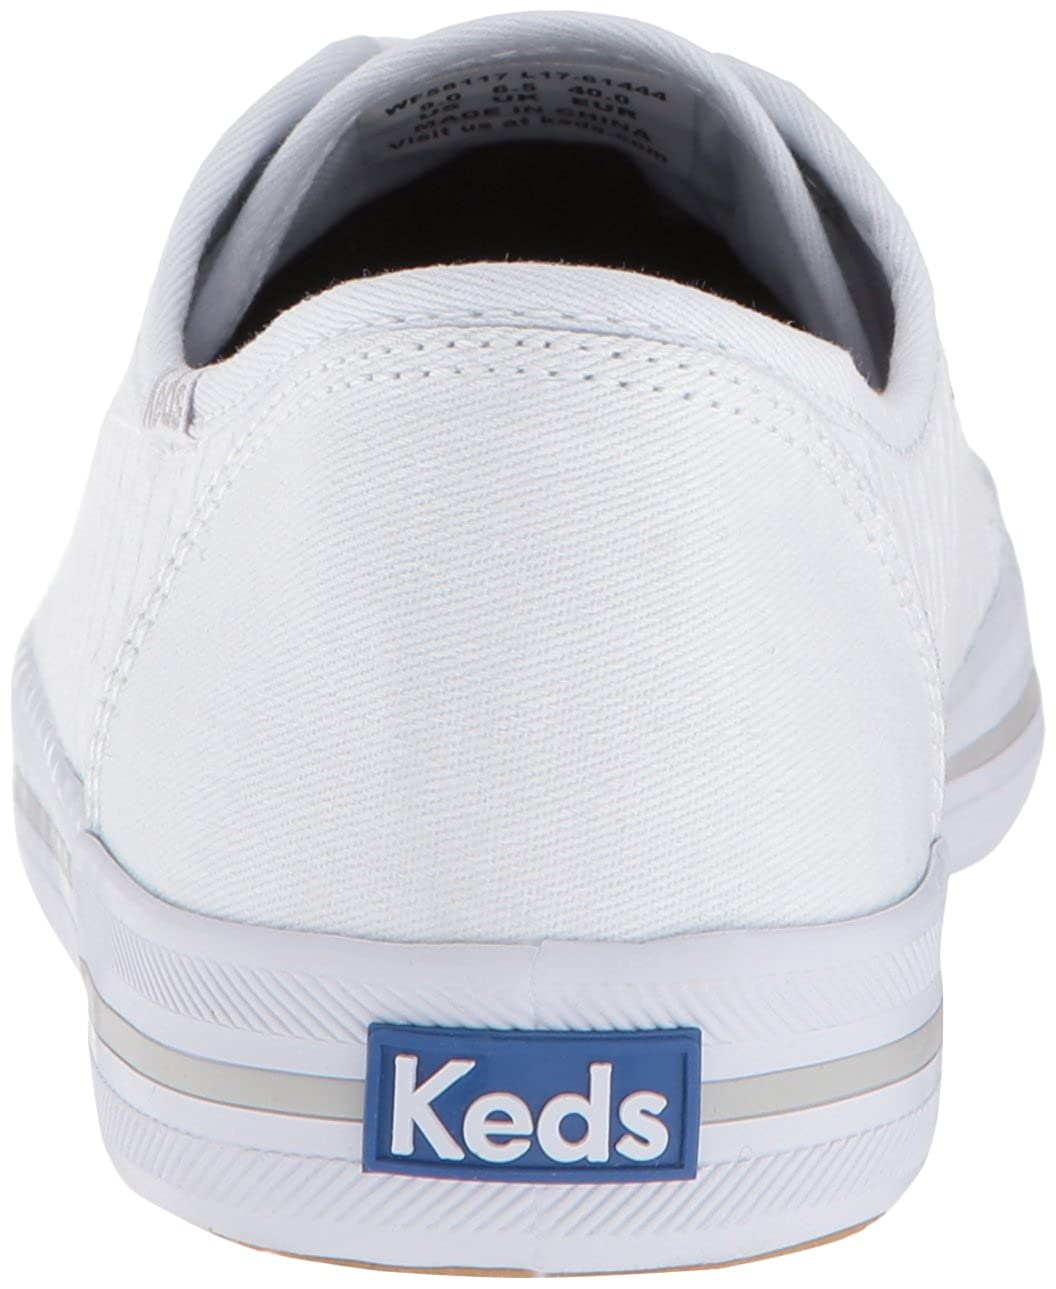 Keds Womens Kickstart Eyelet Stripe Sneakers